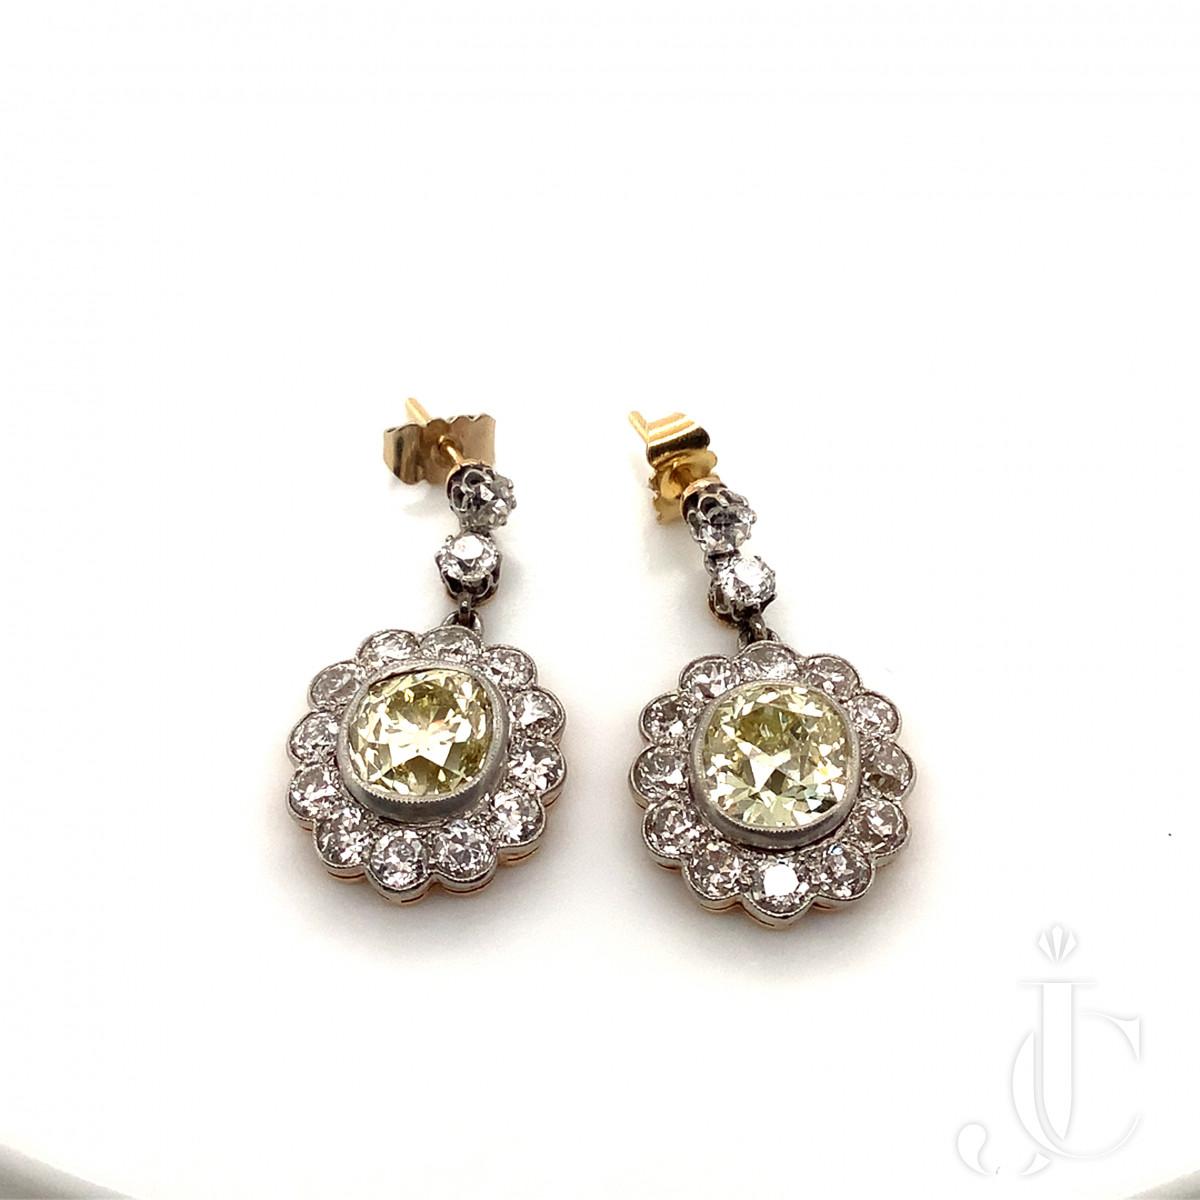 Pair of Edwardian Yellow Diamond Cushion Earrings